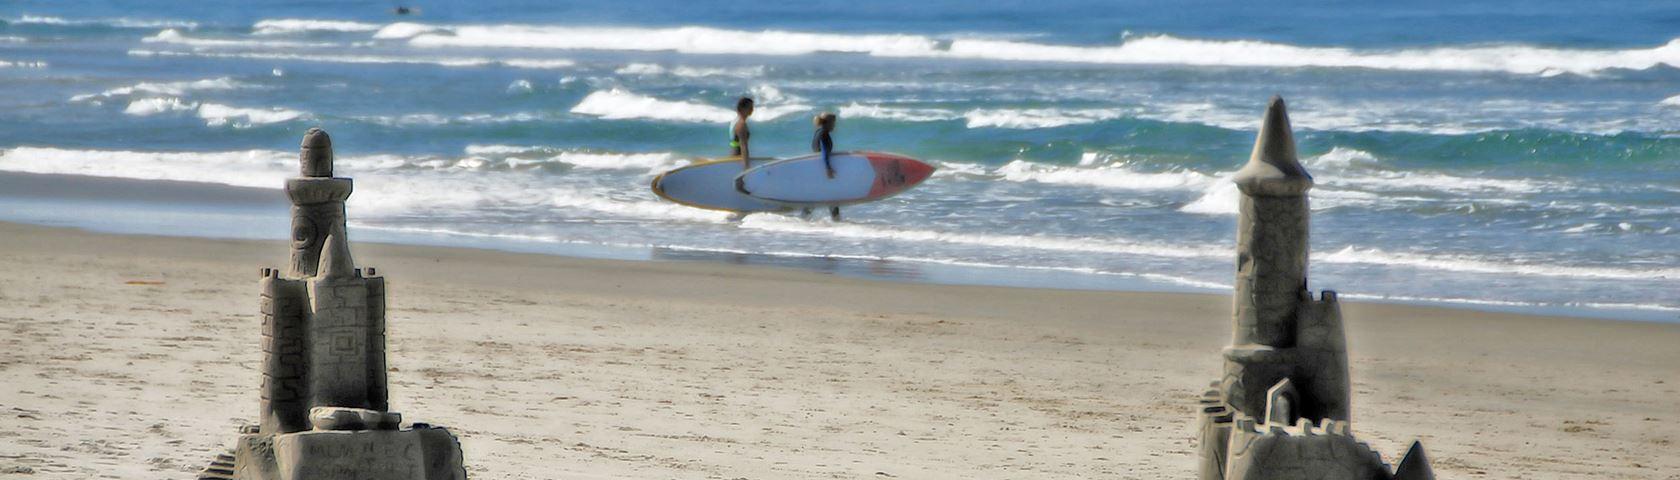 Sand Castle Surfing 2